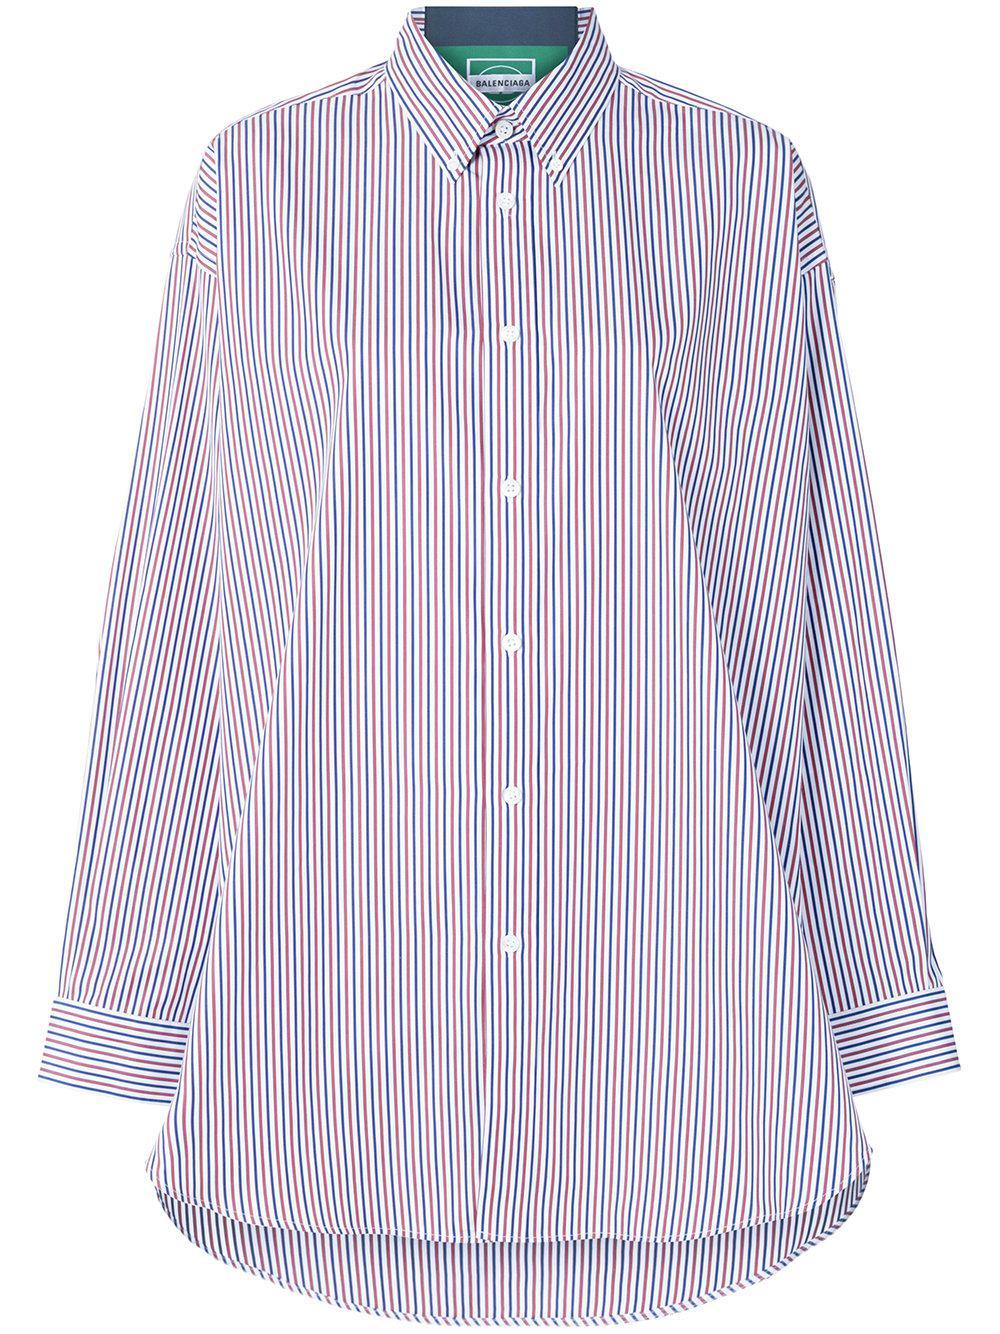 Tag Oversized Appliquéd Striped Cotton-poplin Shirt - Blue Balenciaga Choice Cheap Price Visit For Sale n8mITKRP